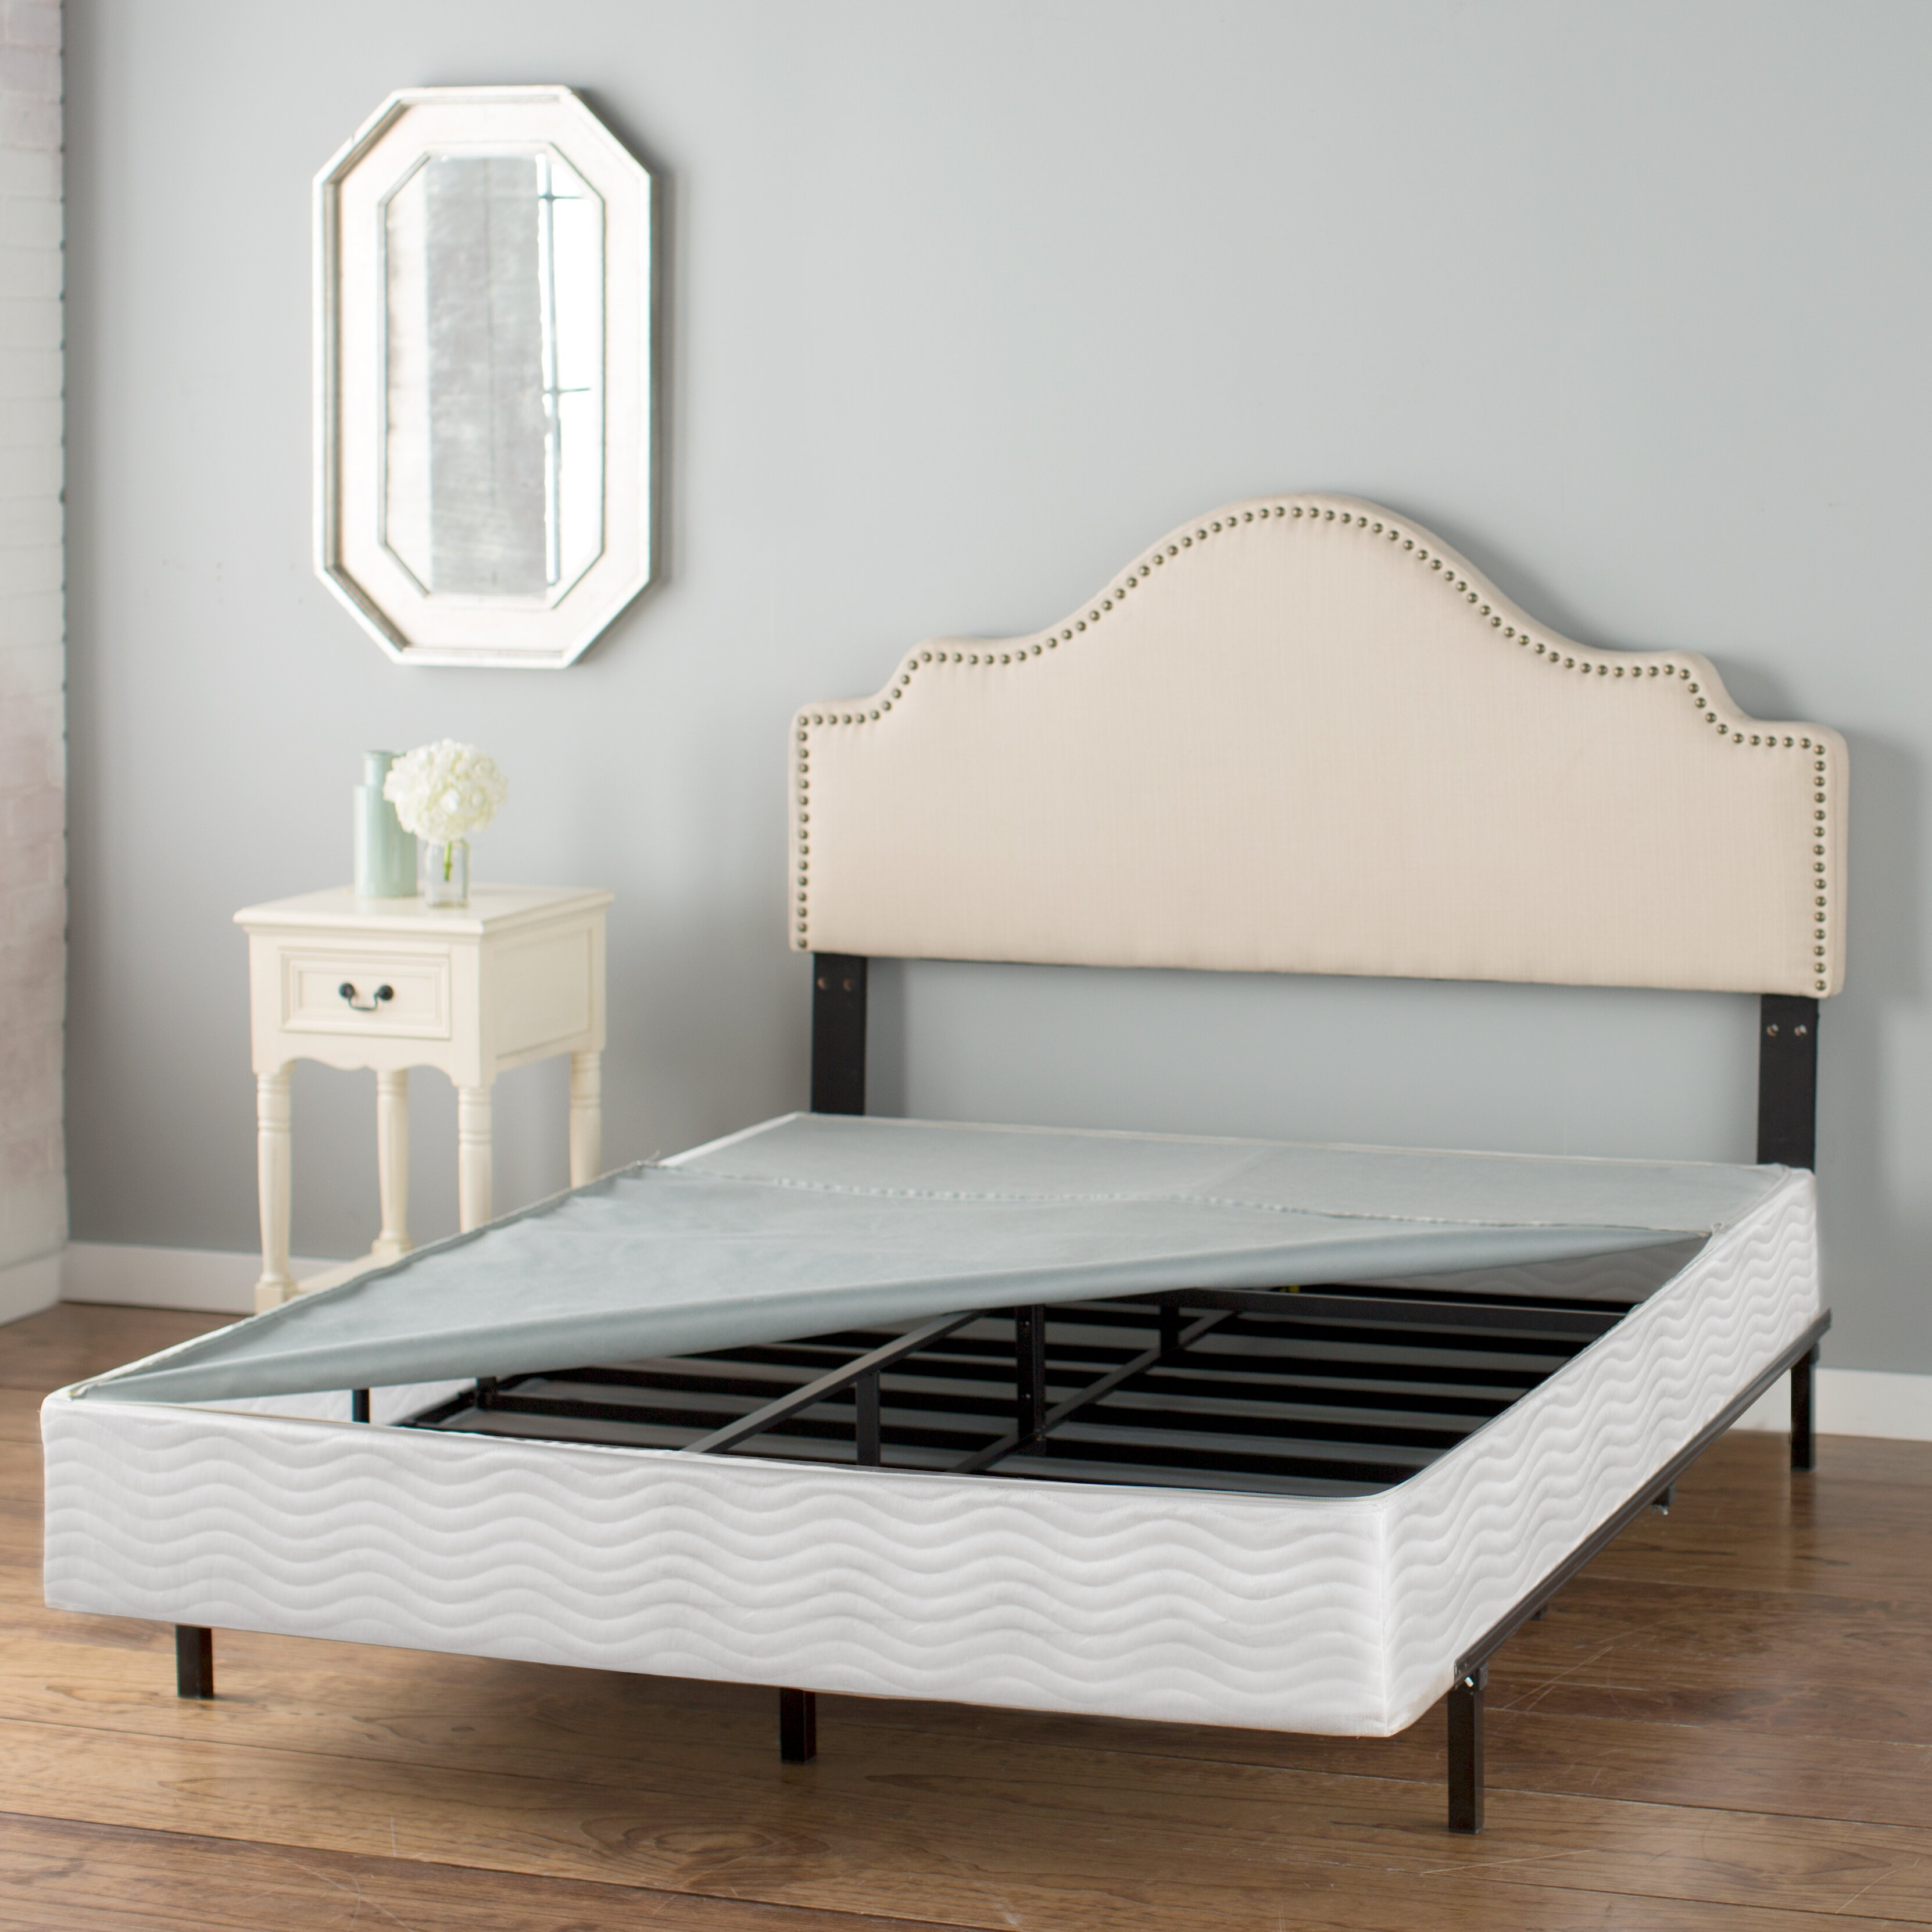 Wayfair Sleep Wayfair Sleep Standard Box Spring & Reviews